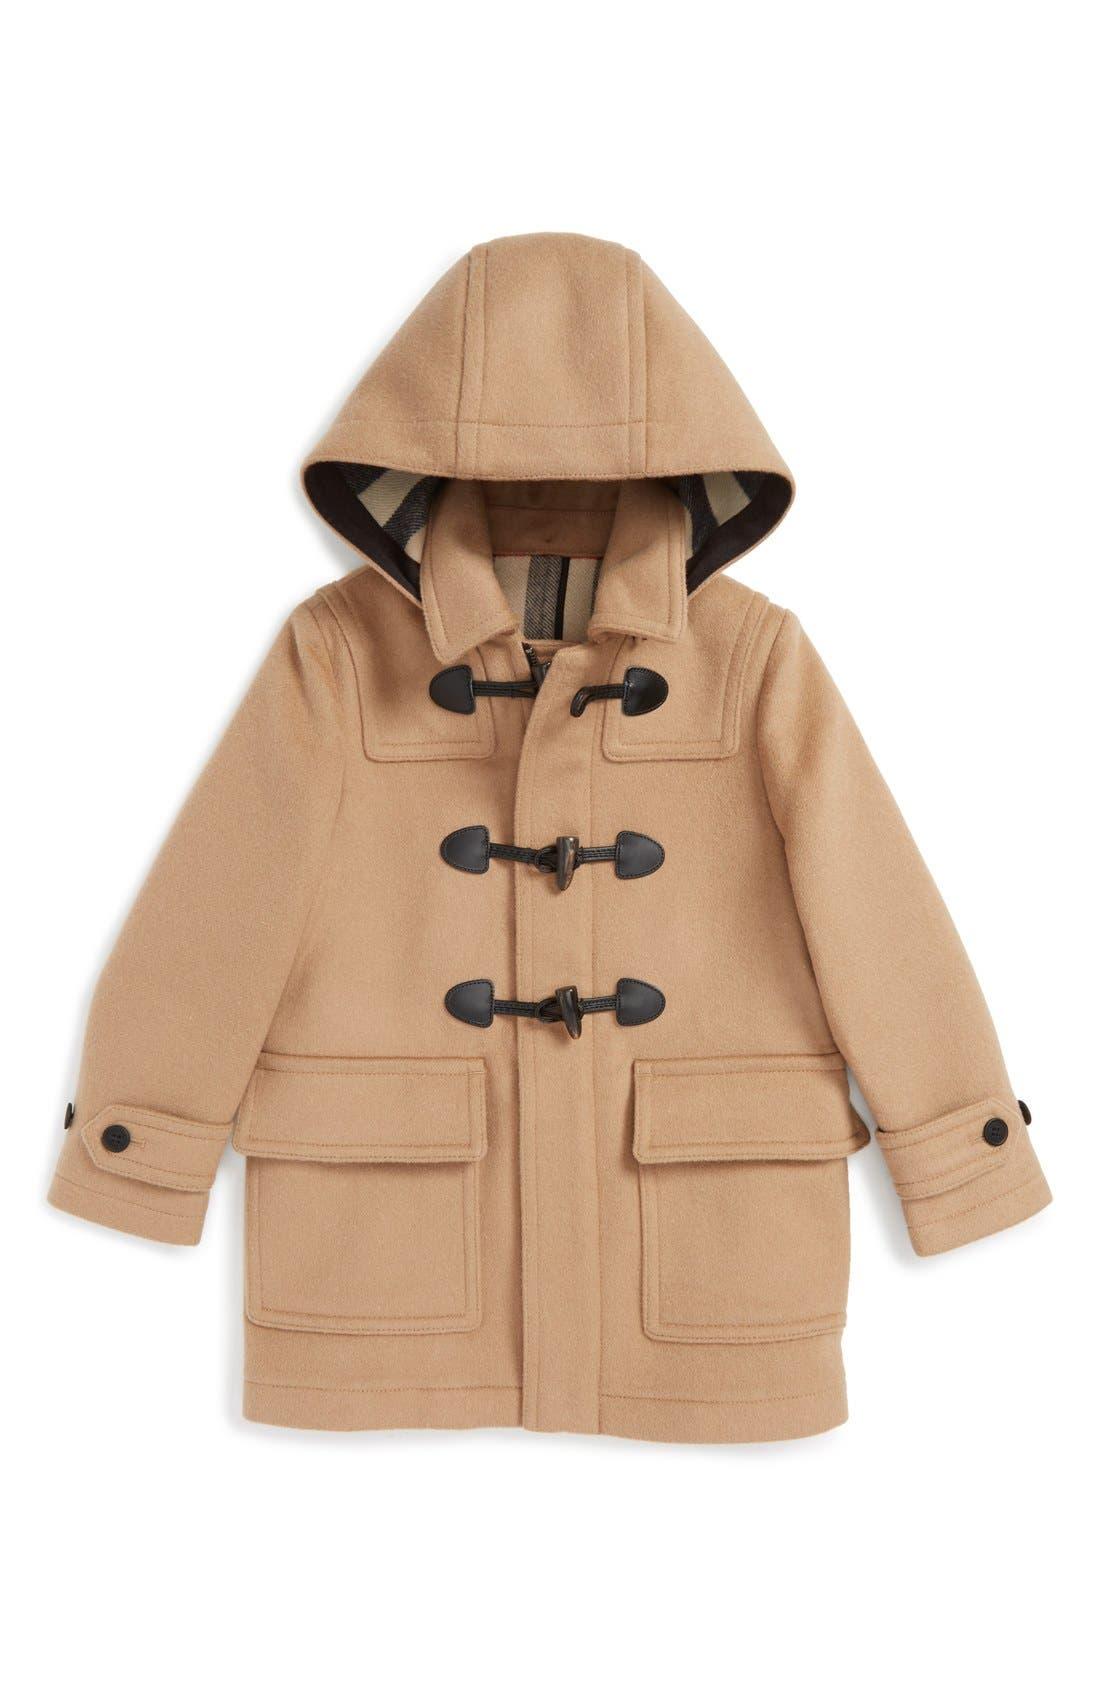 Main Image - Burberry 'Burwood' Wool Toggle Coat (Little Boys & Big Boys)